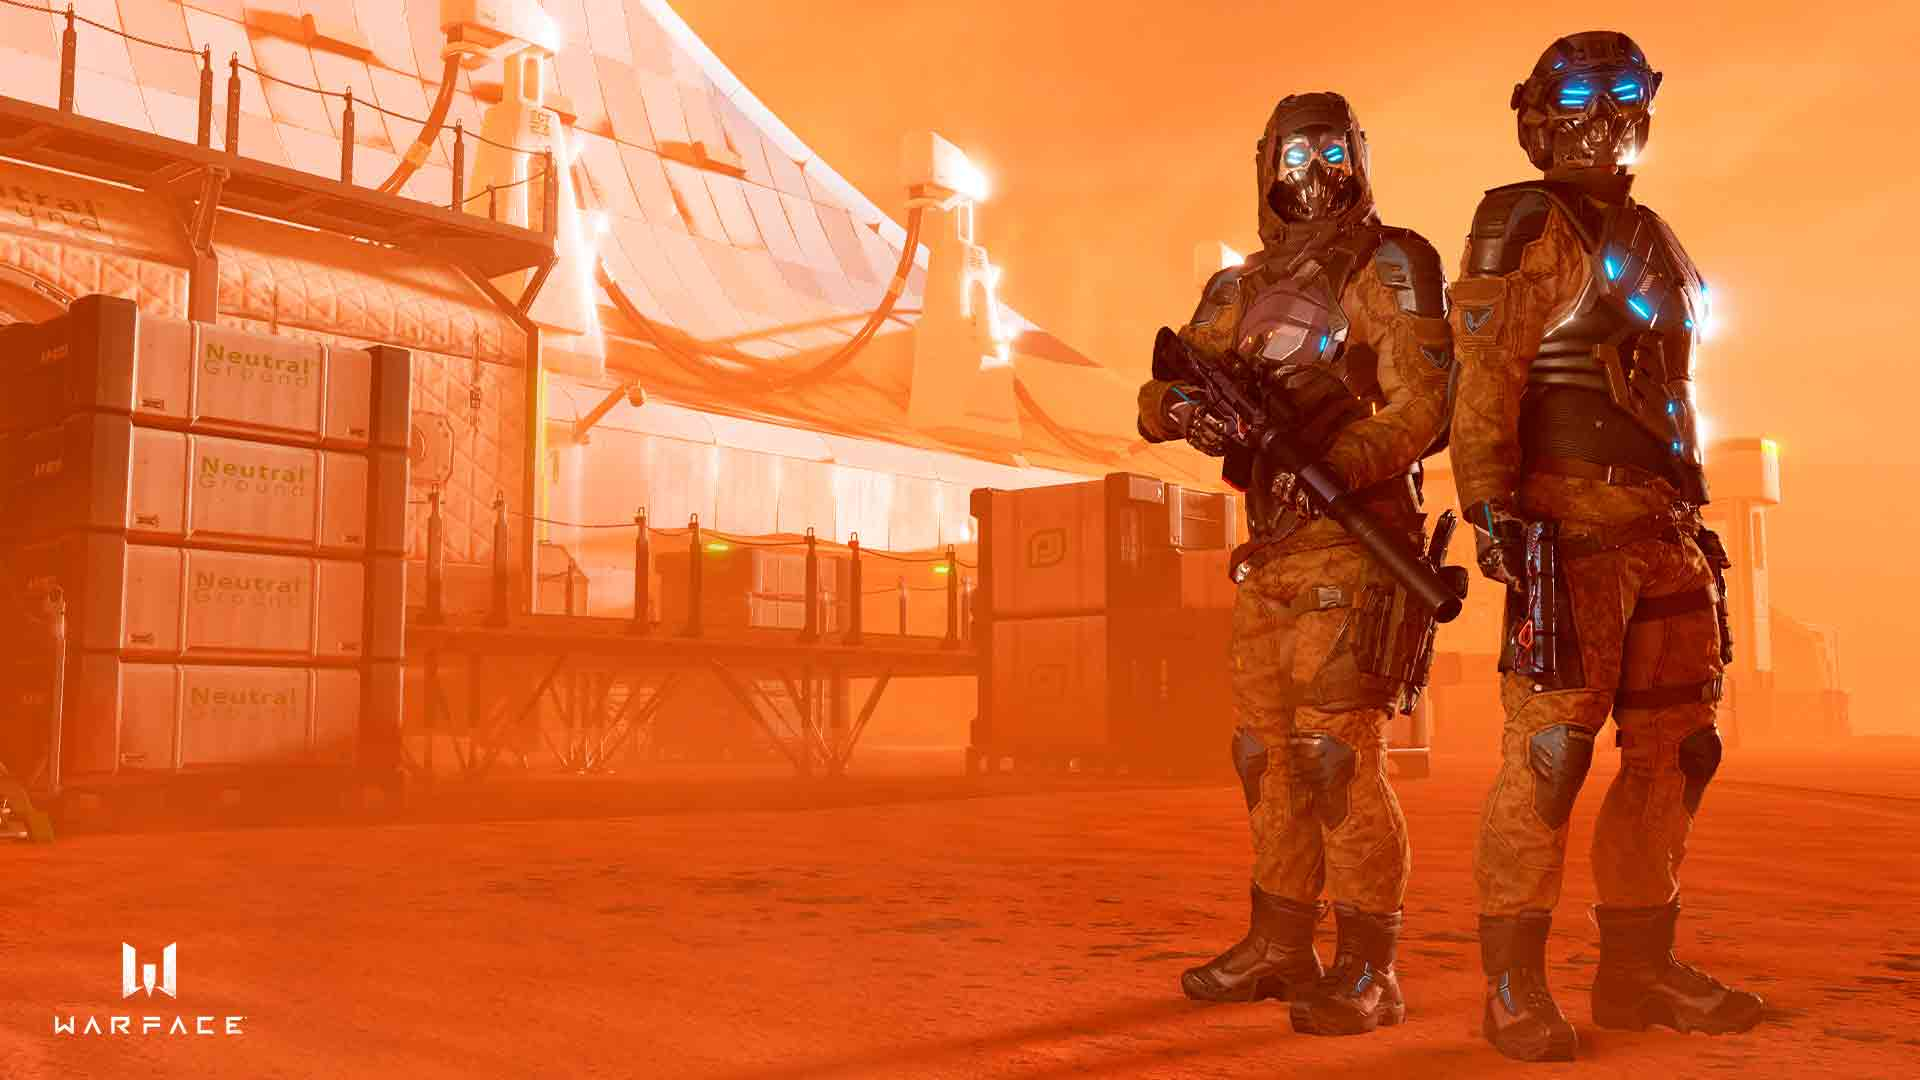 Ivan Pabiarzhyn Warface Mars Update, Cross-Play, Next Generation Consoles Interview